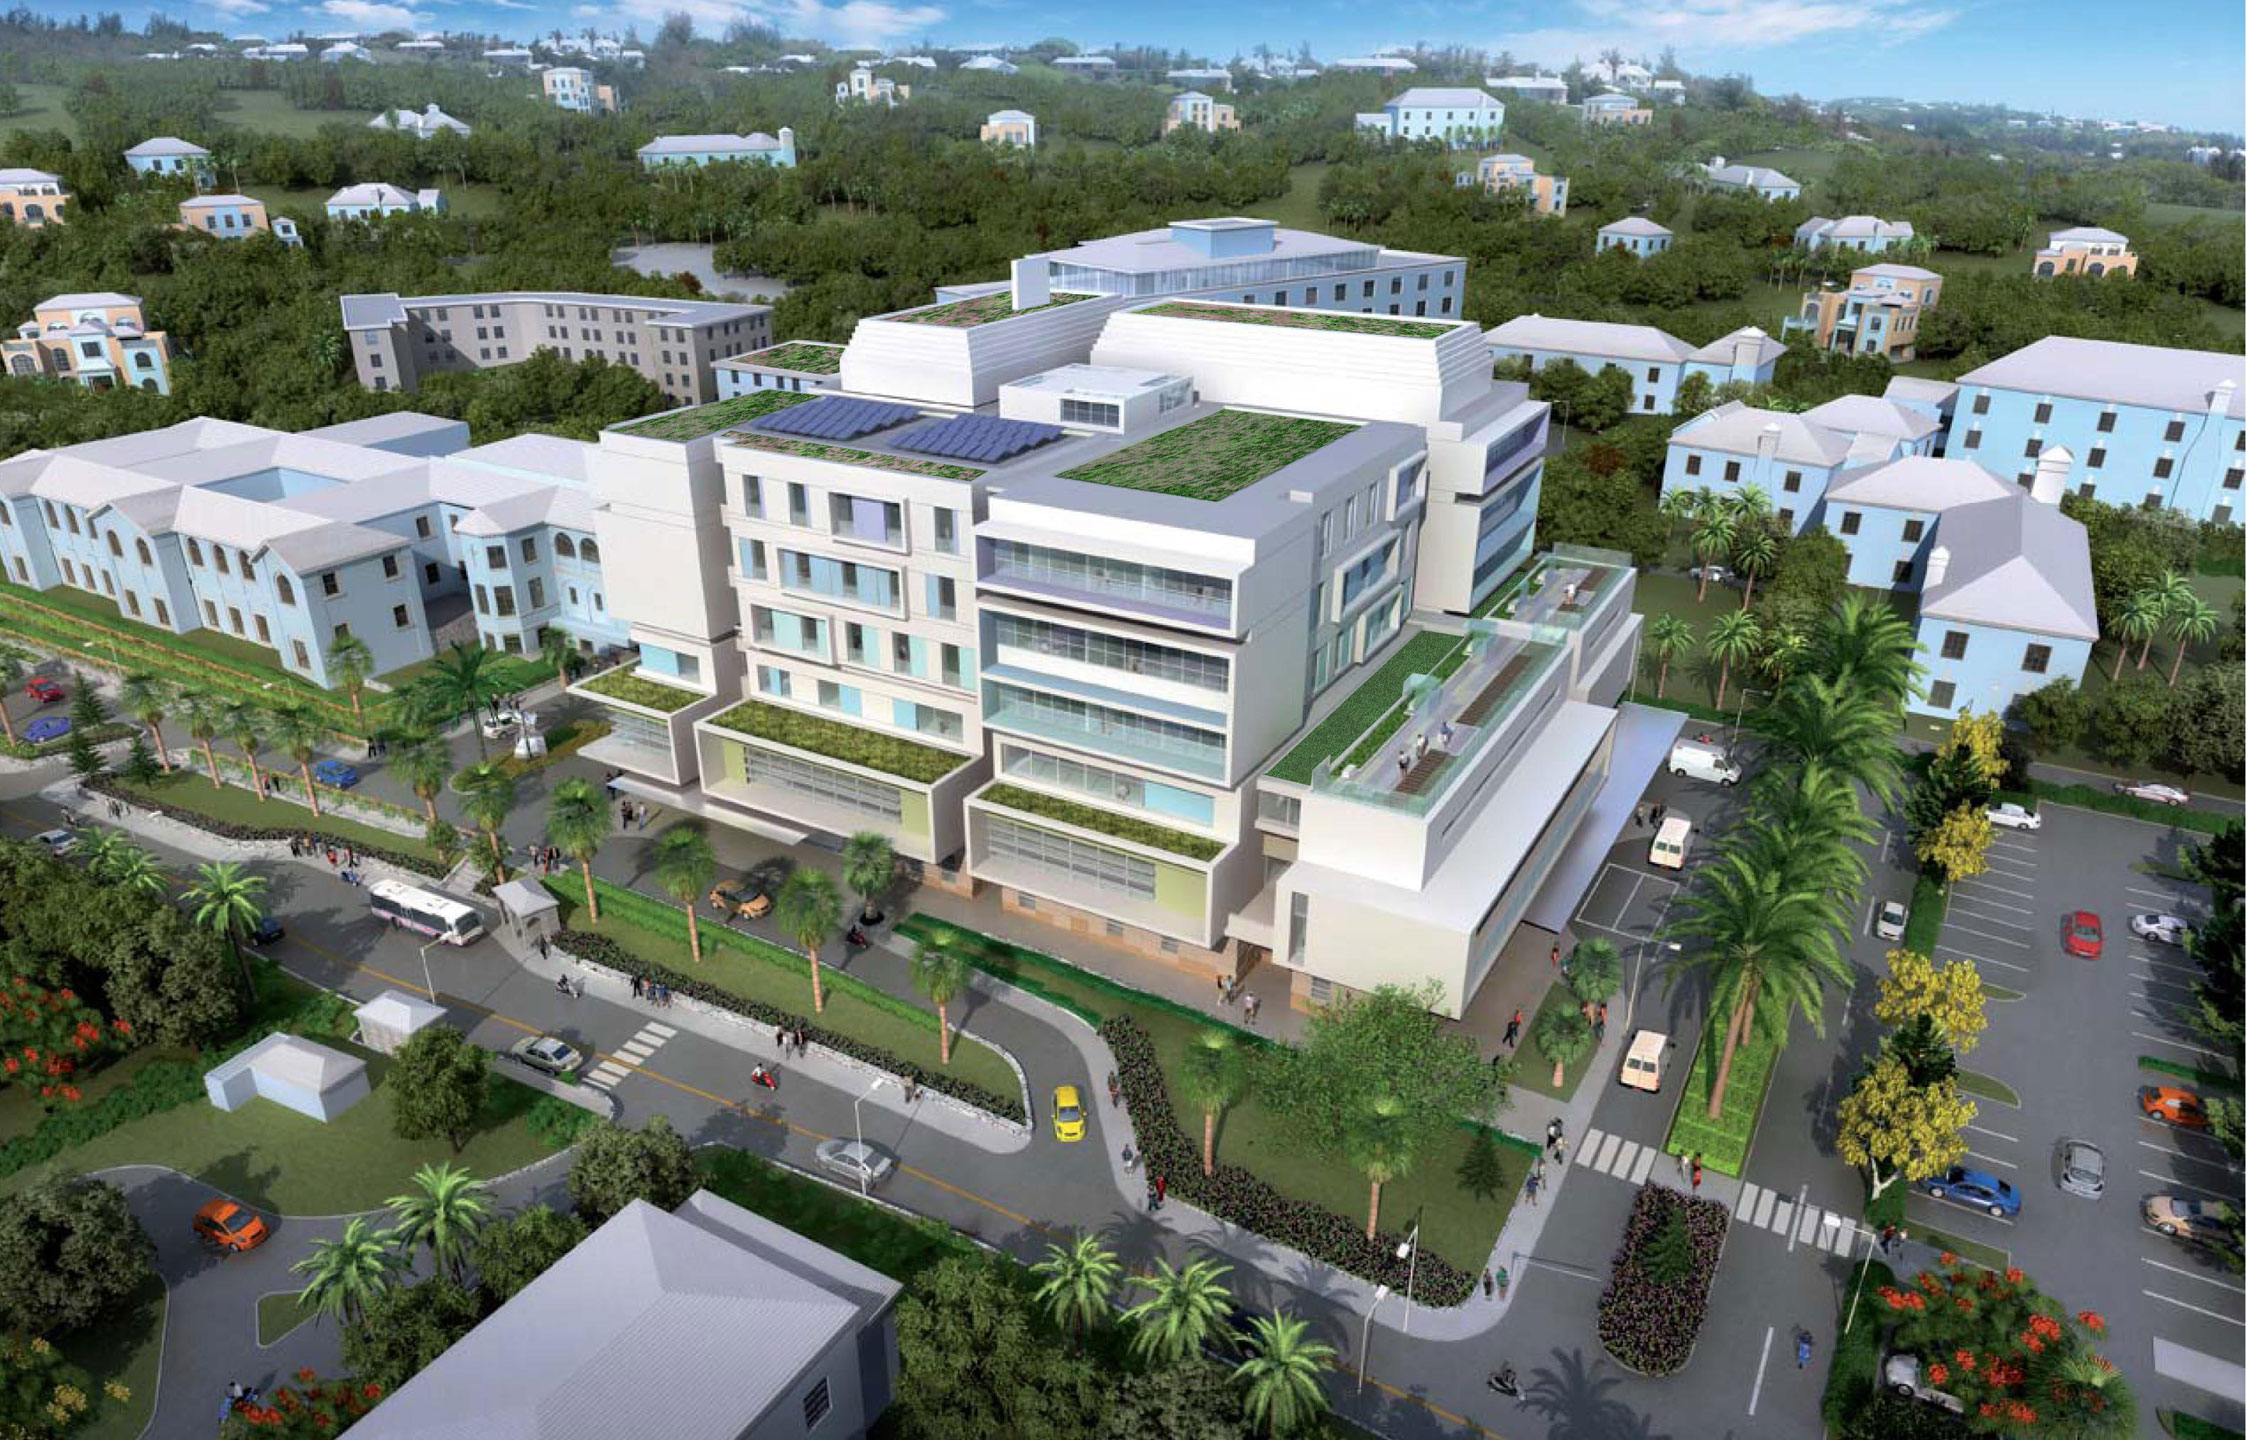 King Edward Memorial Hospital - Aerial Perspective